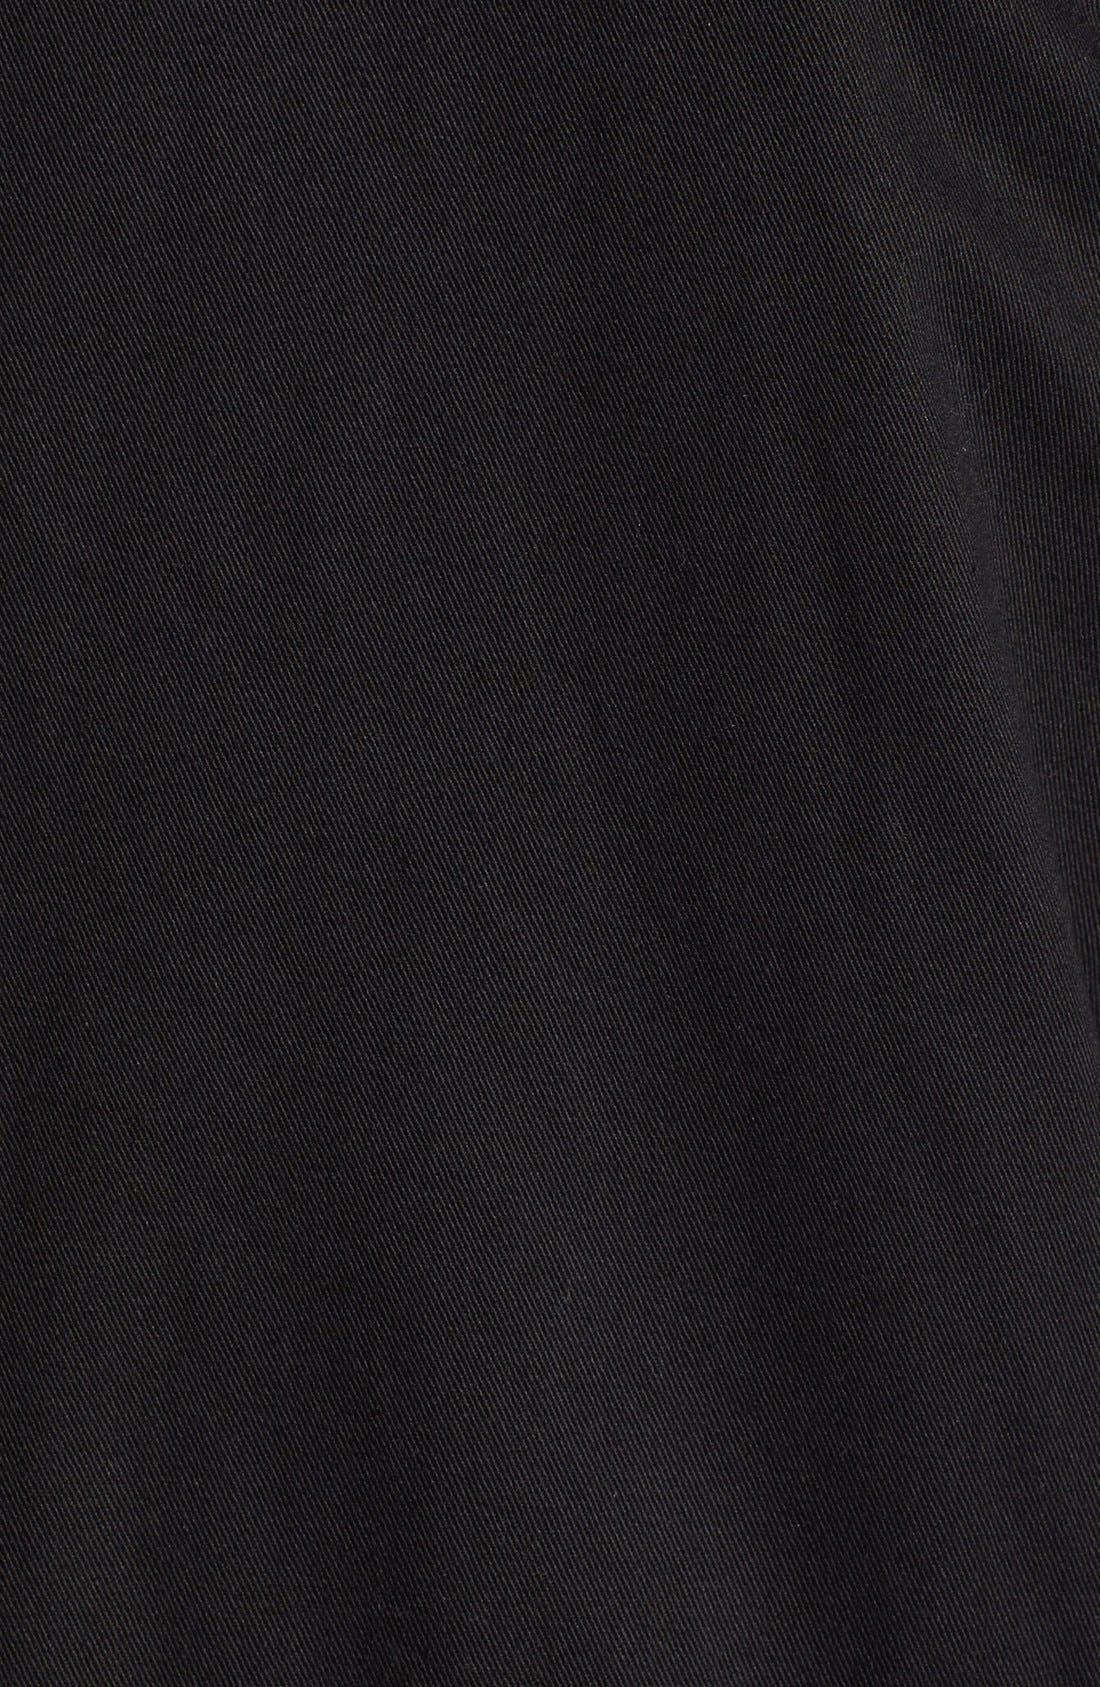 Alternate Image 3  - Topman Fishtail Parka with Detachable Faux Fur Trimmed Hood